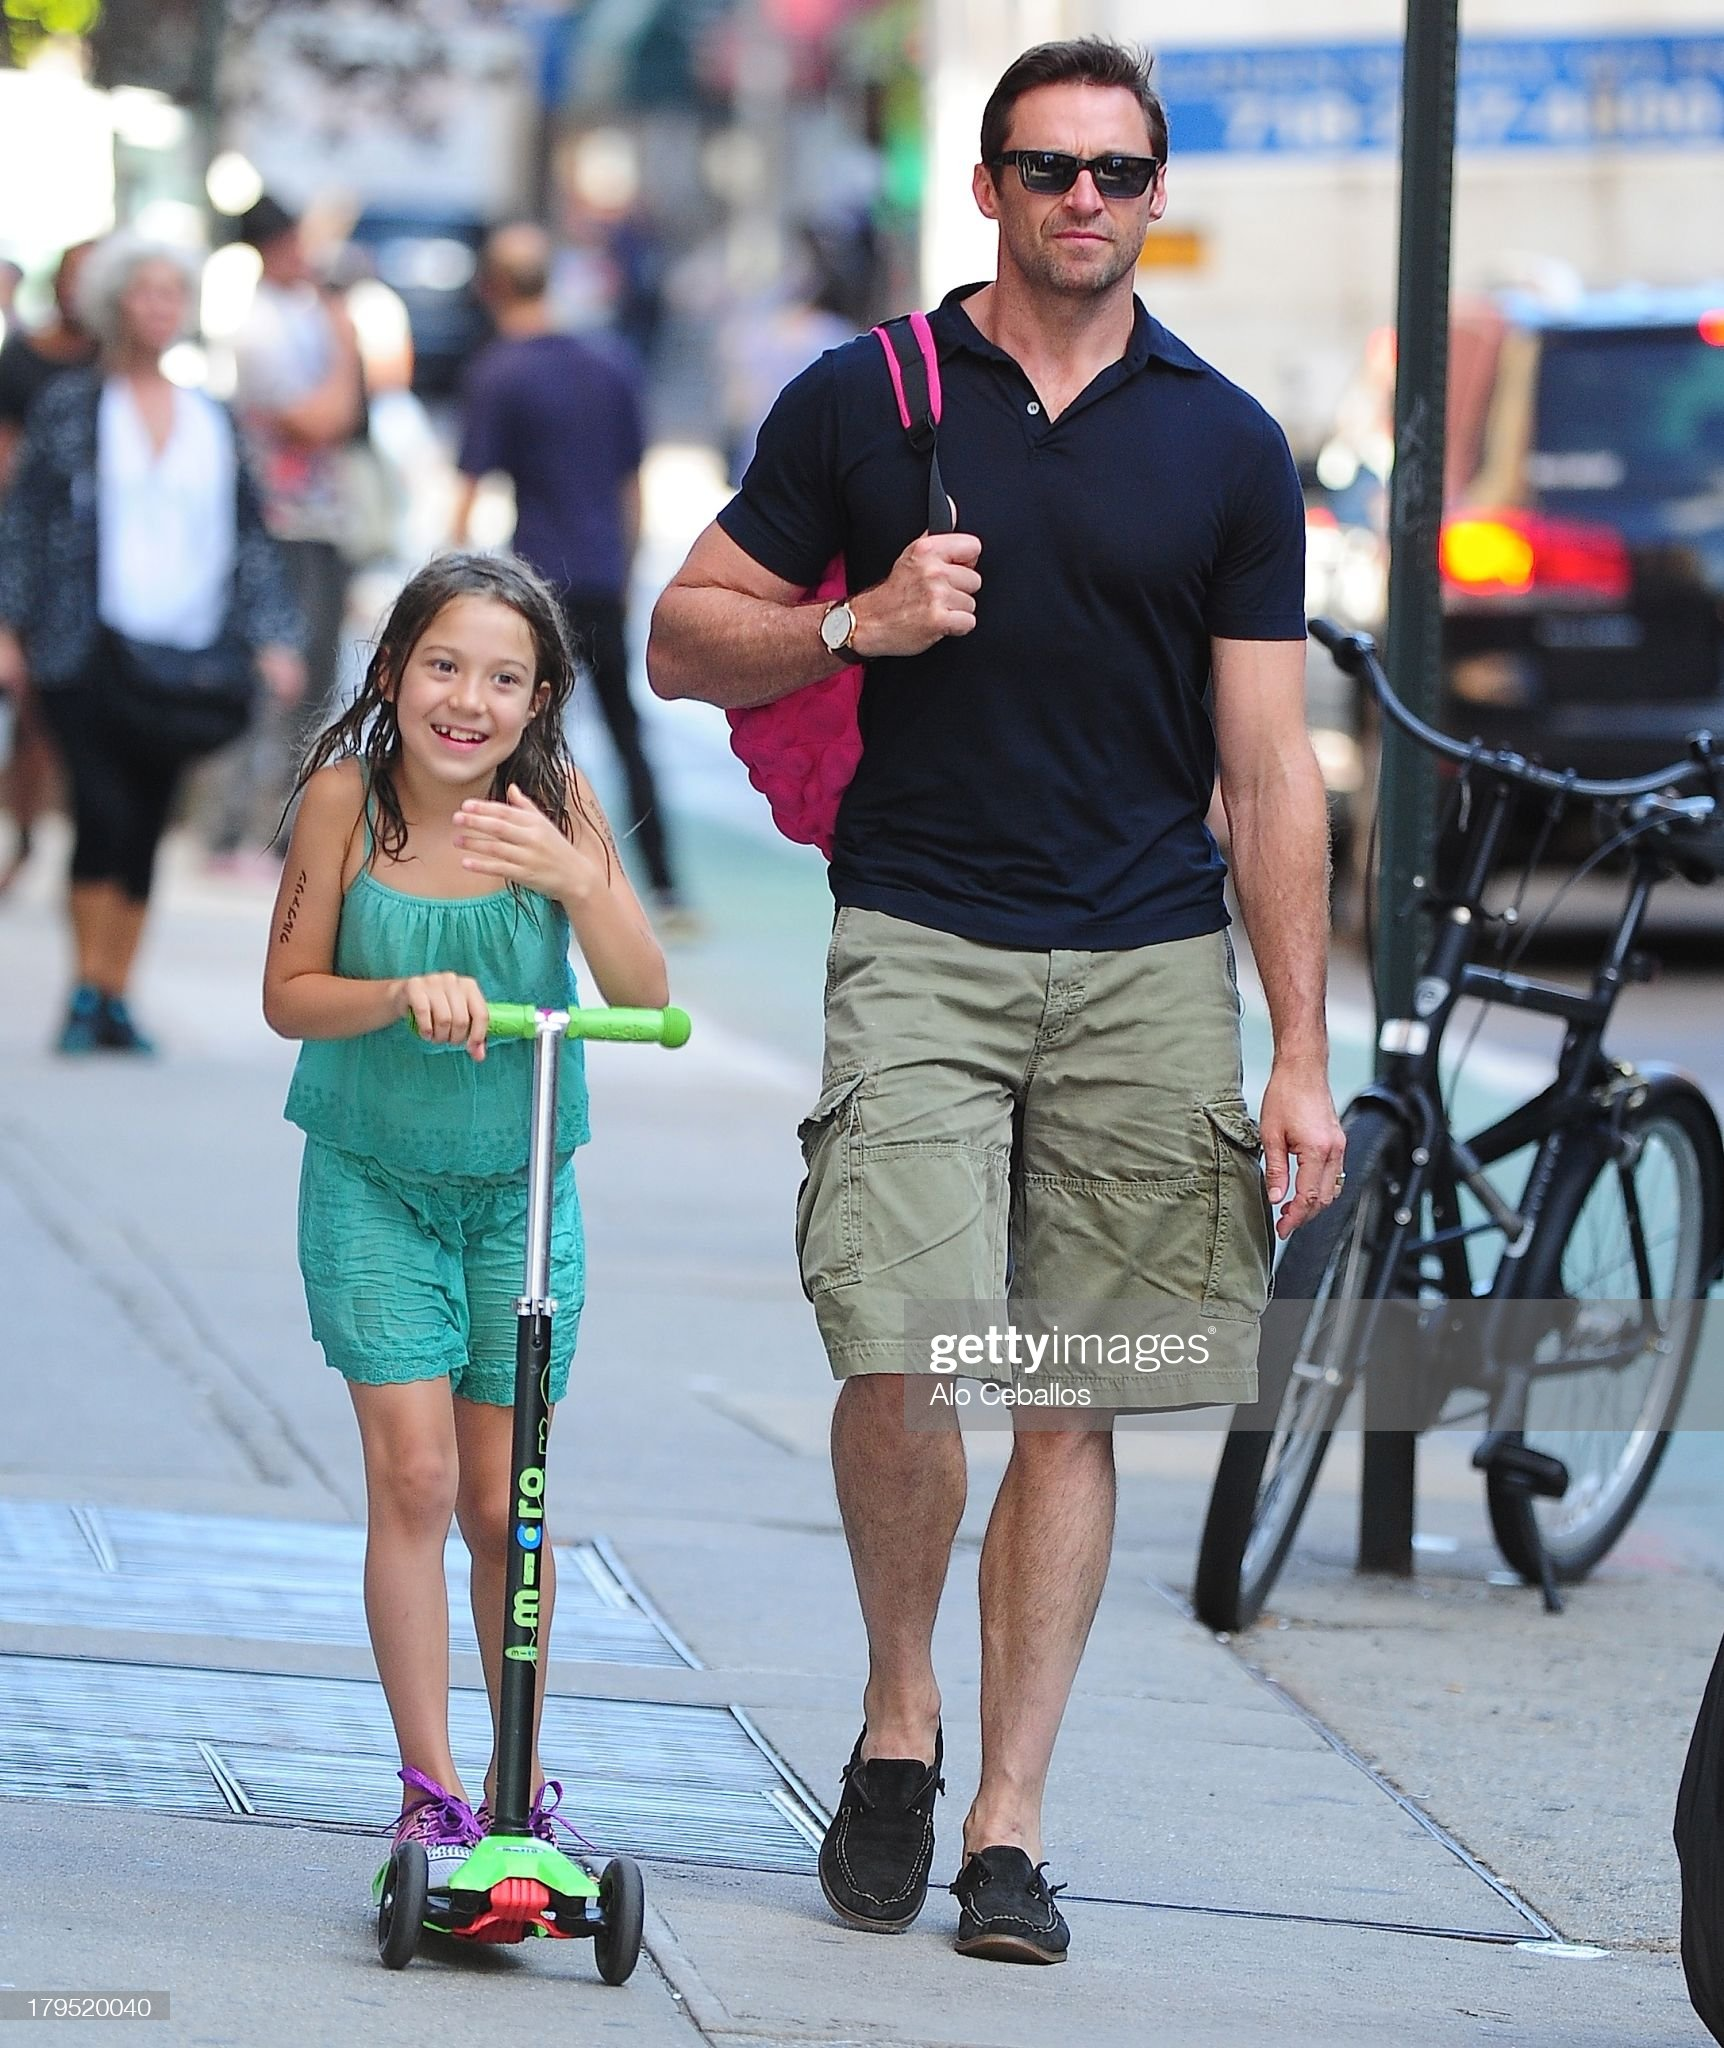 Celebrity Sightings In New York City - September 4, 2013 : News Photo